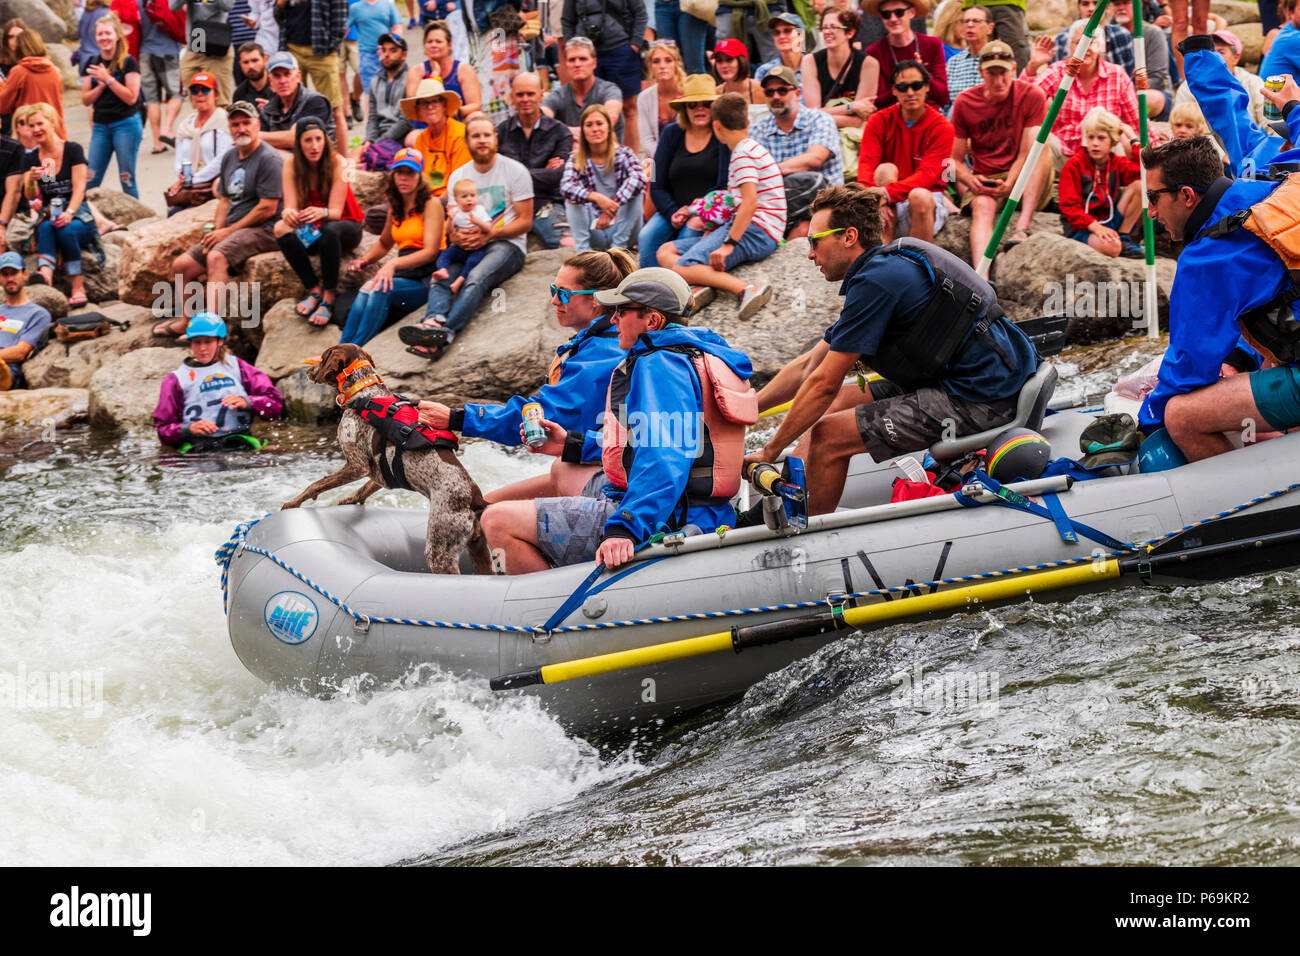 Rafters on Arkansas River, passing through Fibark river festival; Salida; Colorado; USA - Stock Image